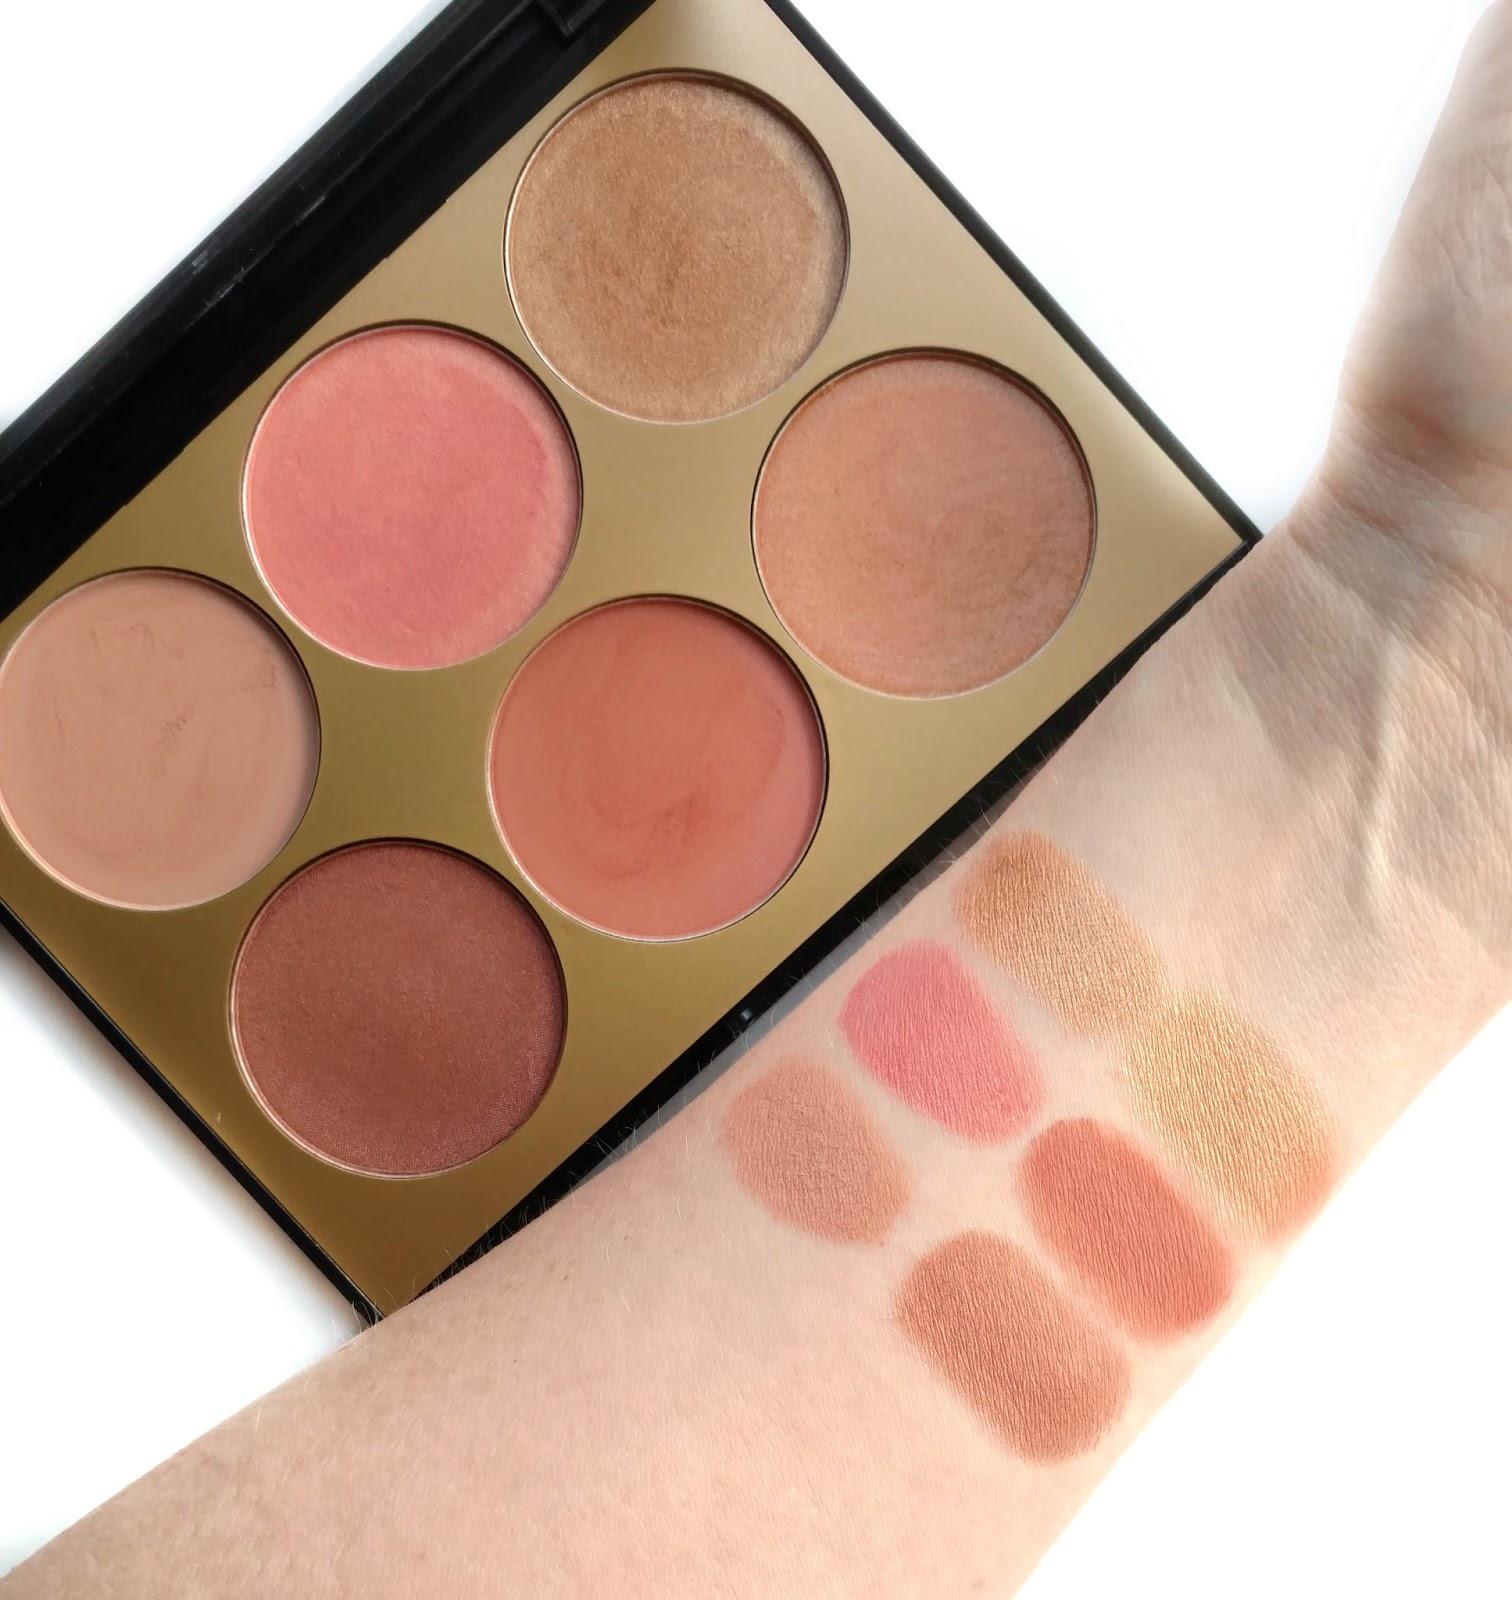 sephora collection contour blush palette swatches